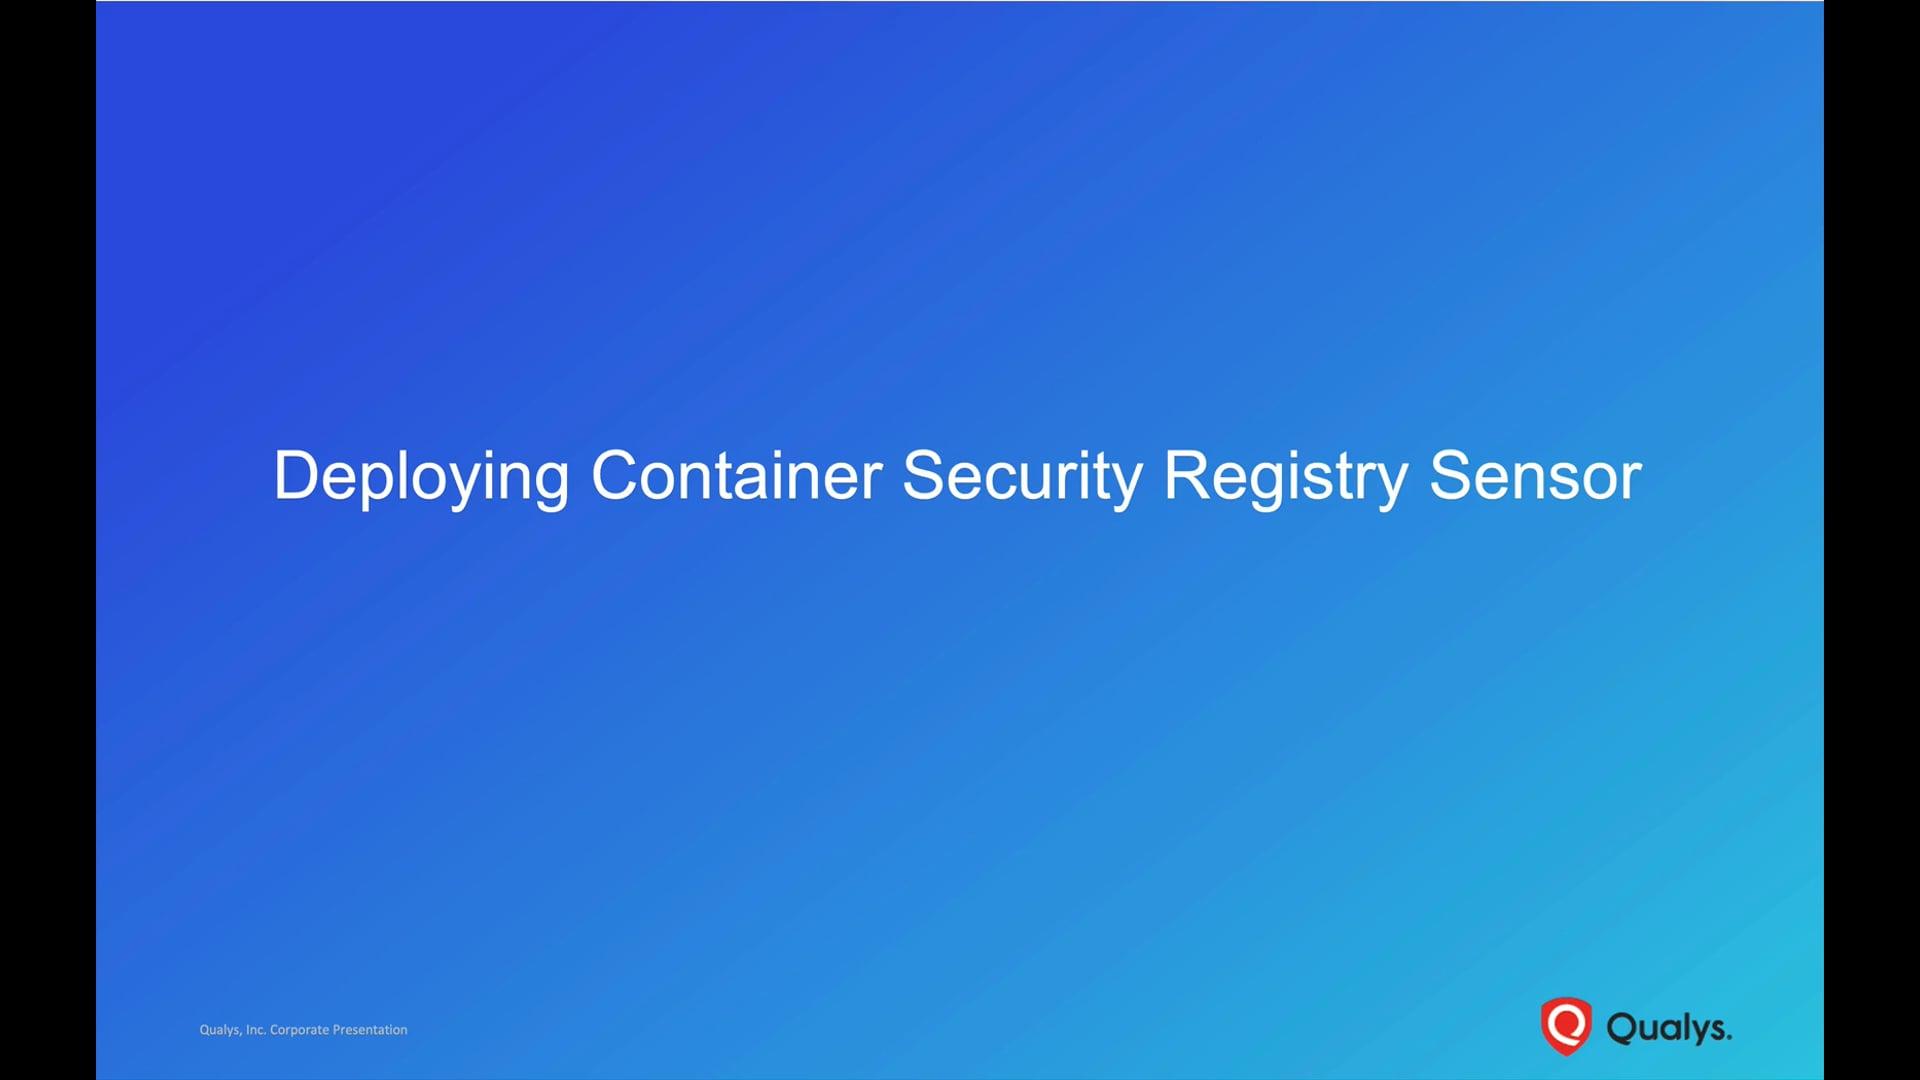 Deploying Container Security Registry Sensor